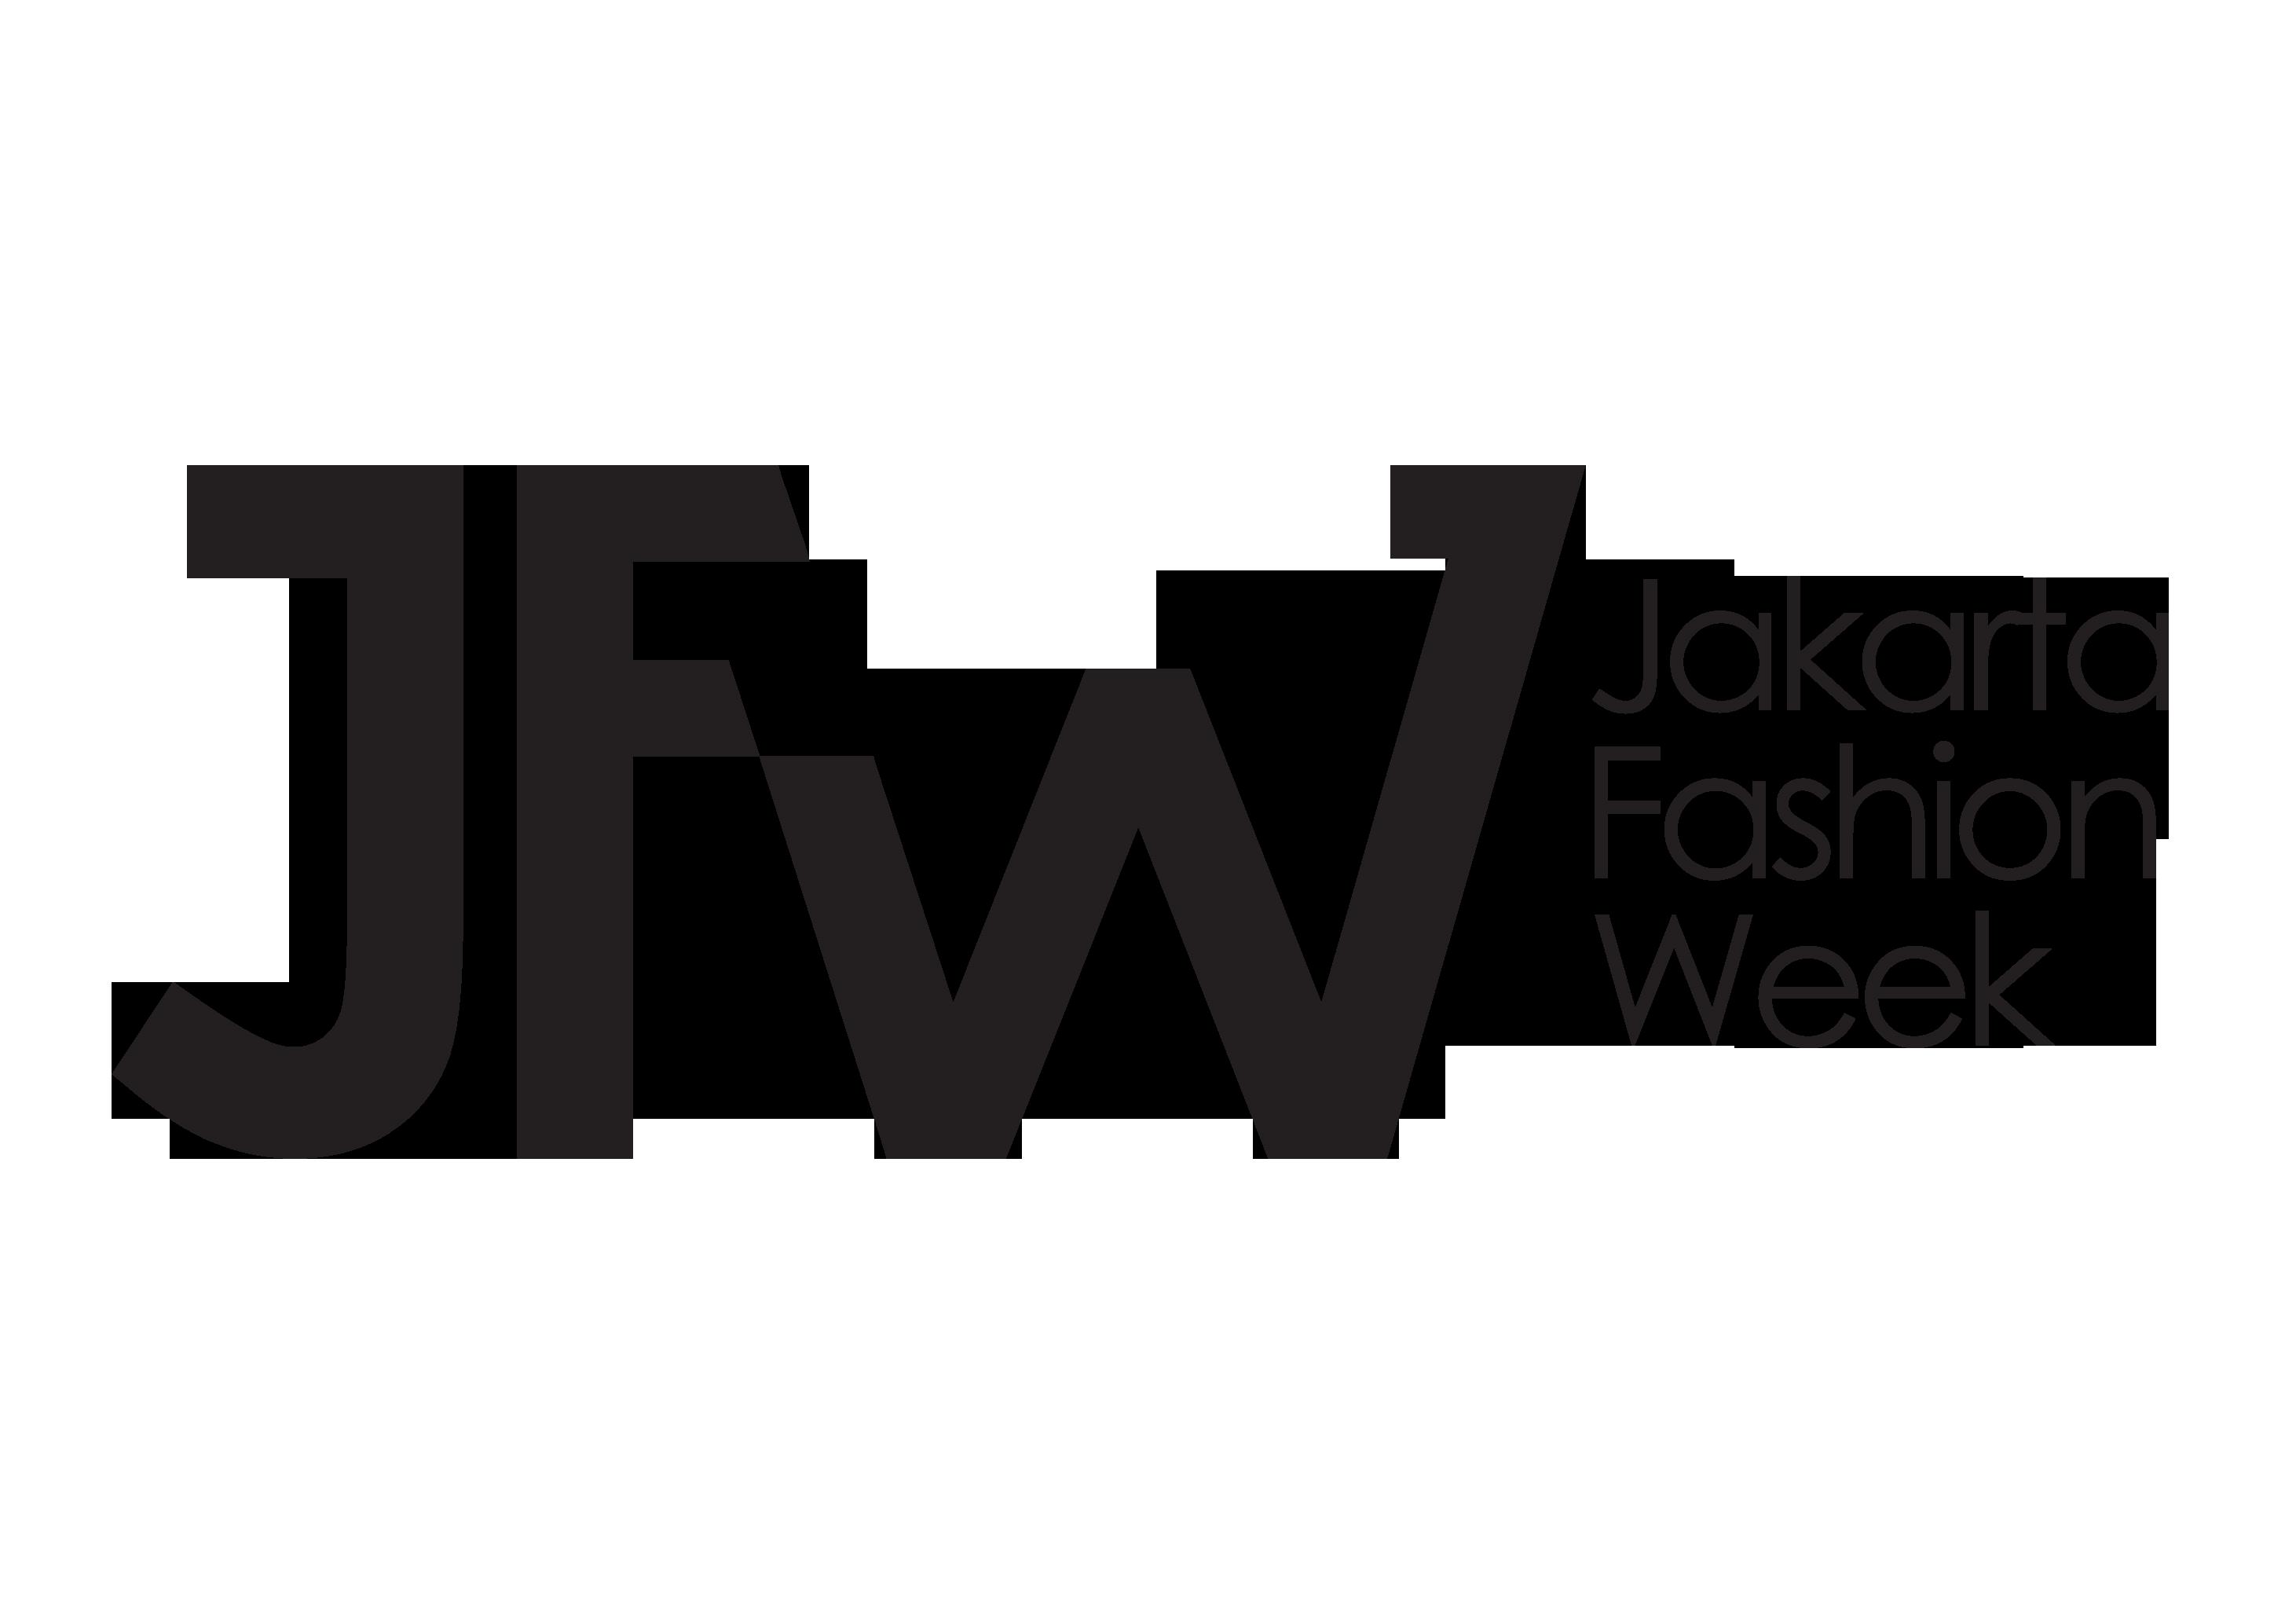 https://www.jakartafashionweek.co.id/